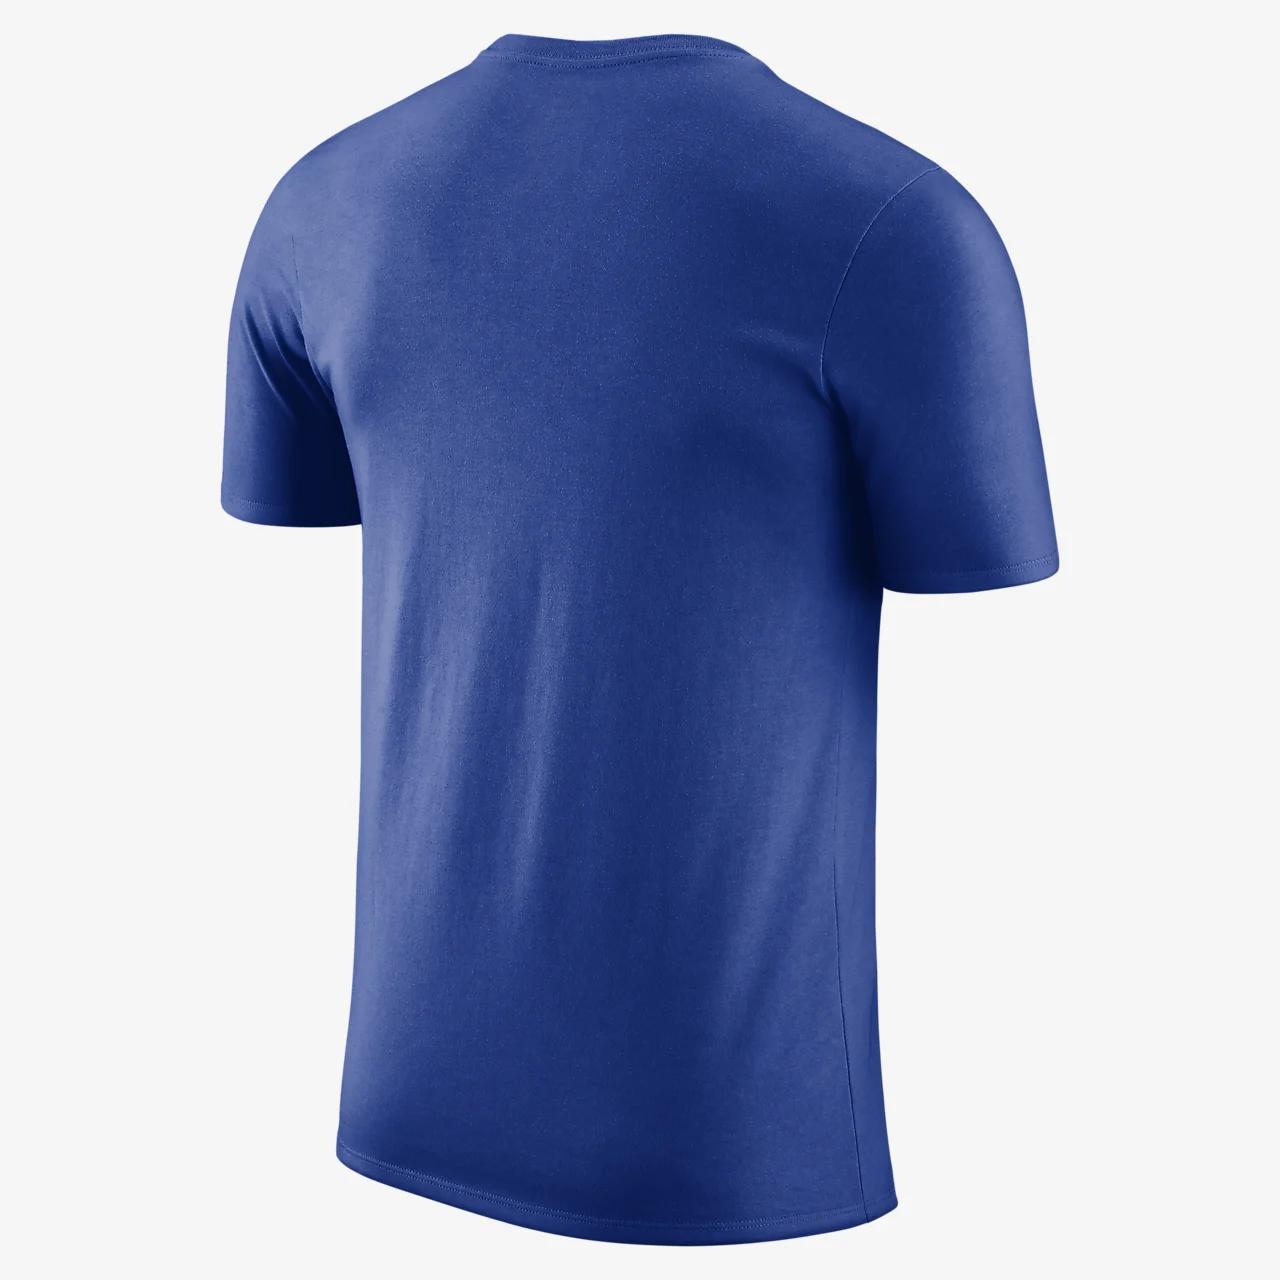 Golden State Warriors Nike Dri-FIT Men's NBA T-Shirt AT1326-495